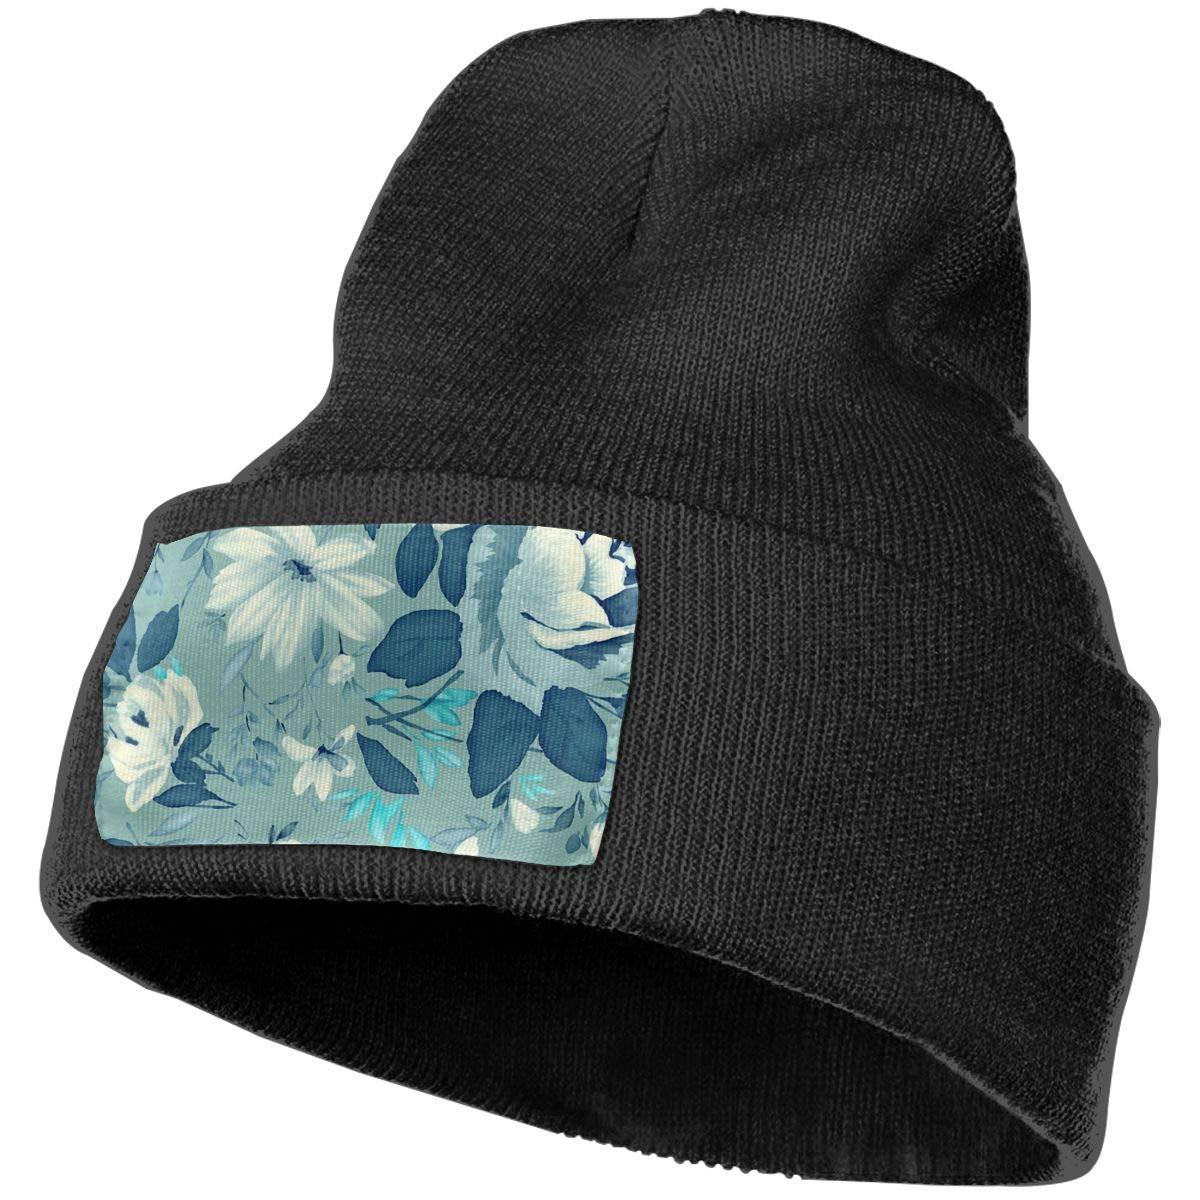 100/% Acrylic Acid Mas Beanie Hat Ruin Flowers Fashion Knitting Hat for Men Women